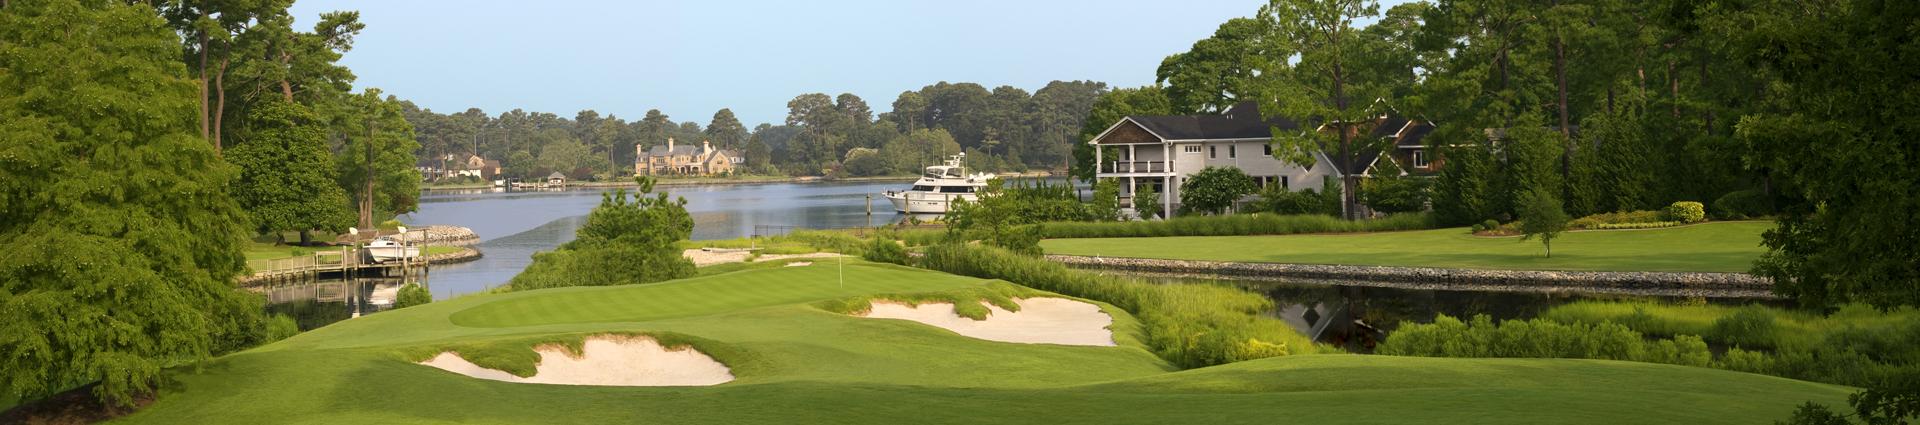 Virginia Golf Course Superintendents Association - Manakin